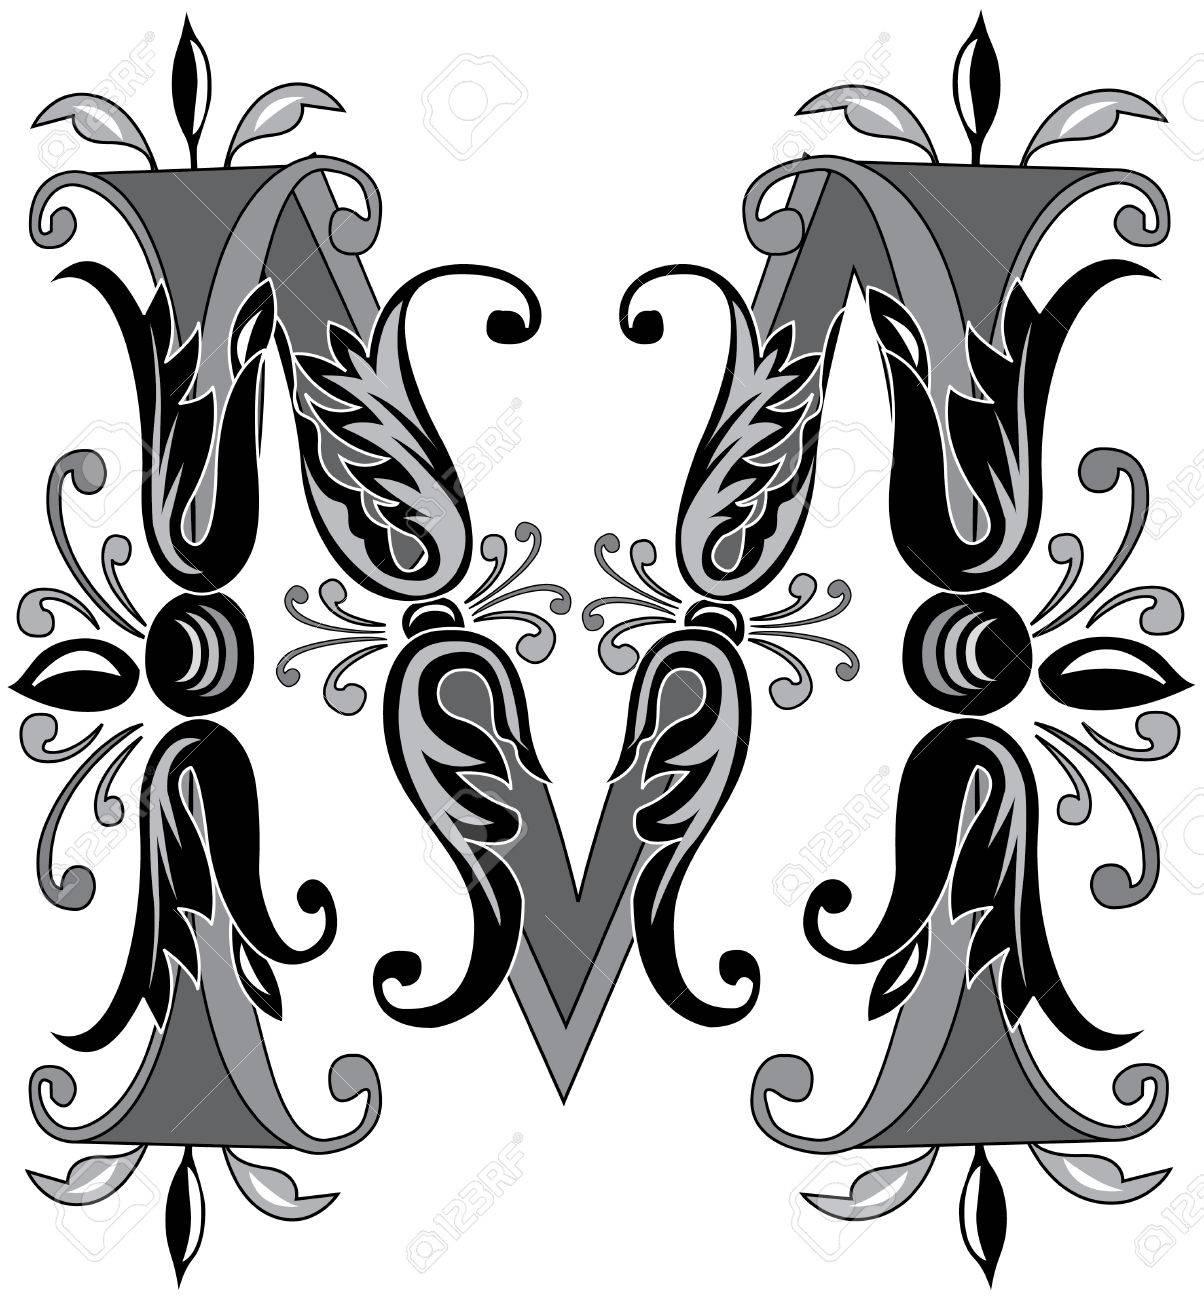 d4e4a50eea9e Follaje alfabeto Inglés, letra M, Blanco y Negro Foto de archivo - 23263363